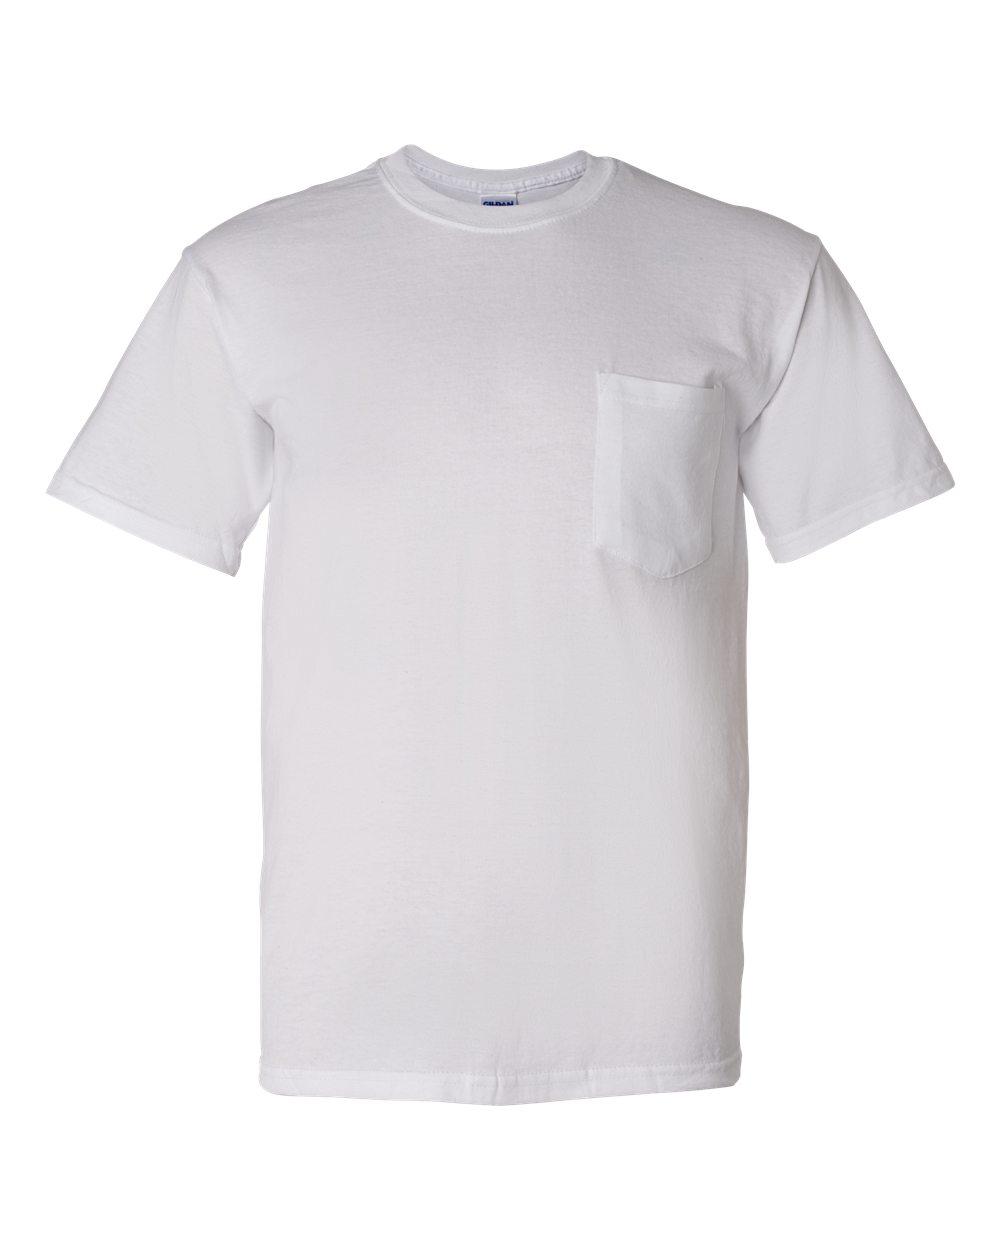 8300 gildan 5 6 oz ultra blend 50 50 pocket t shirt for Bulk pocket t shirts